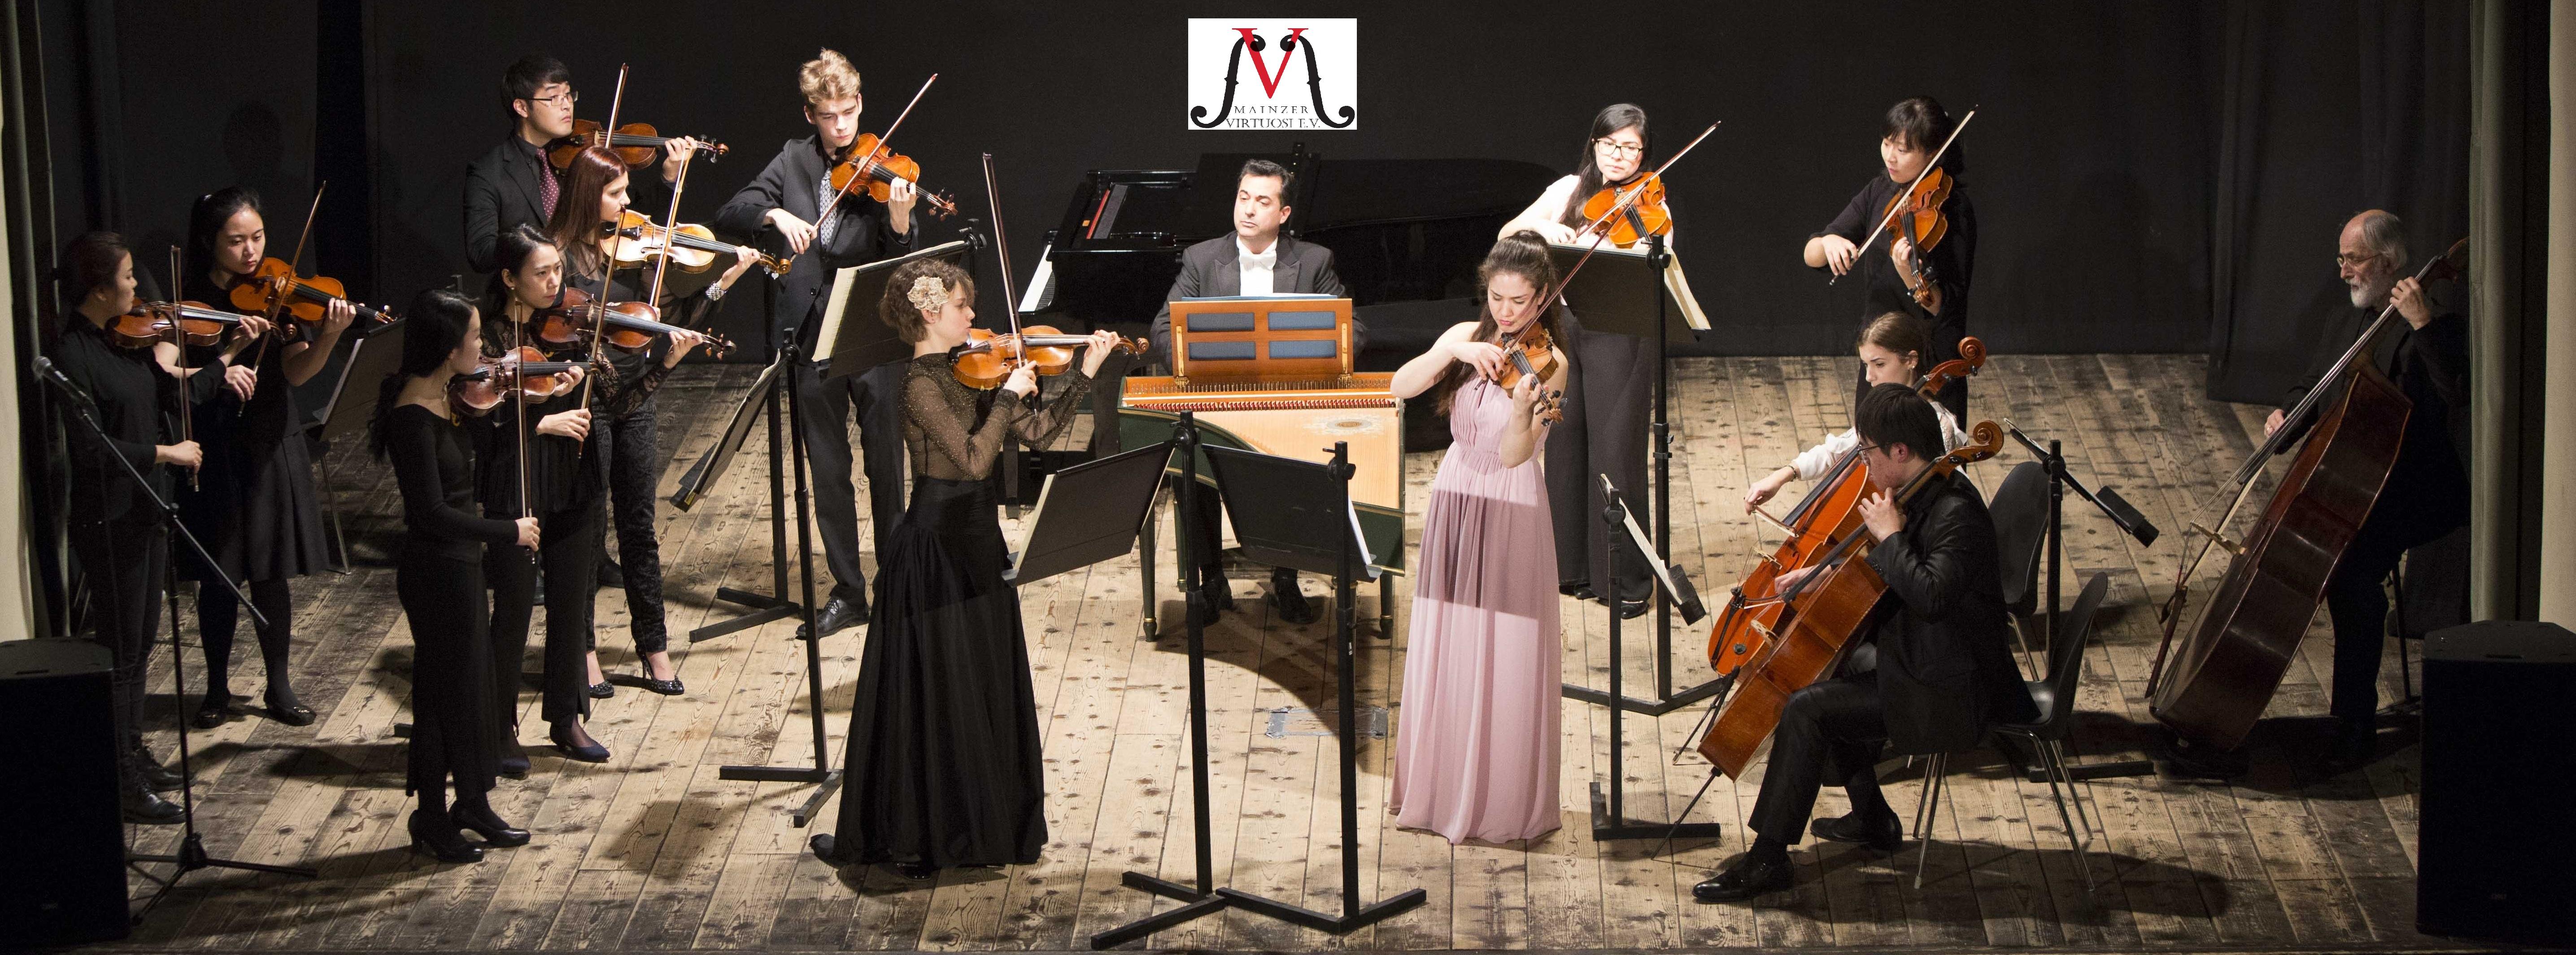 Mainzer virtuosi concert, Agnes Langer and Elizaveta Fediukova - soloists